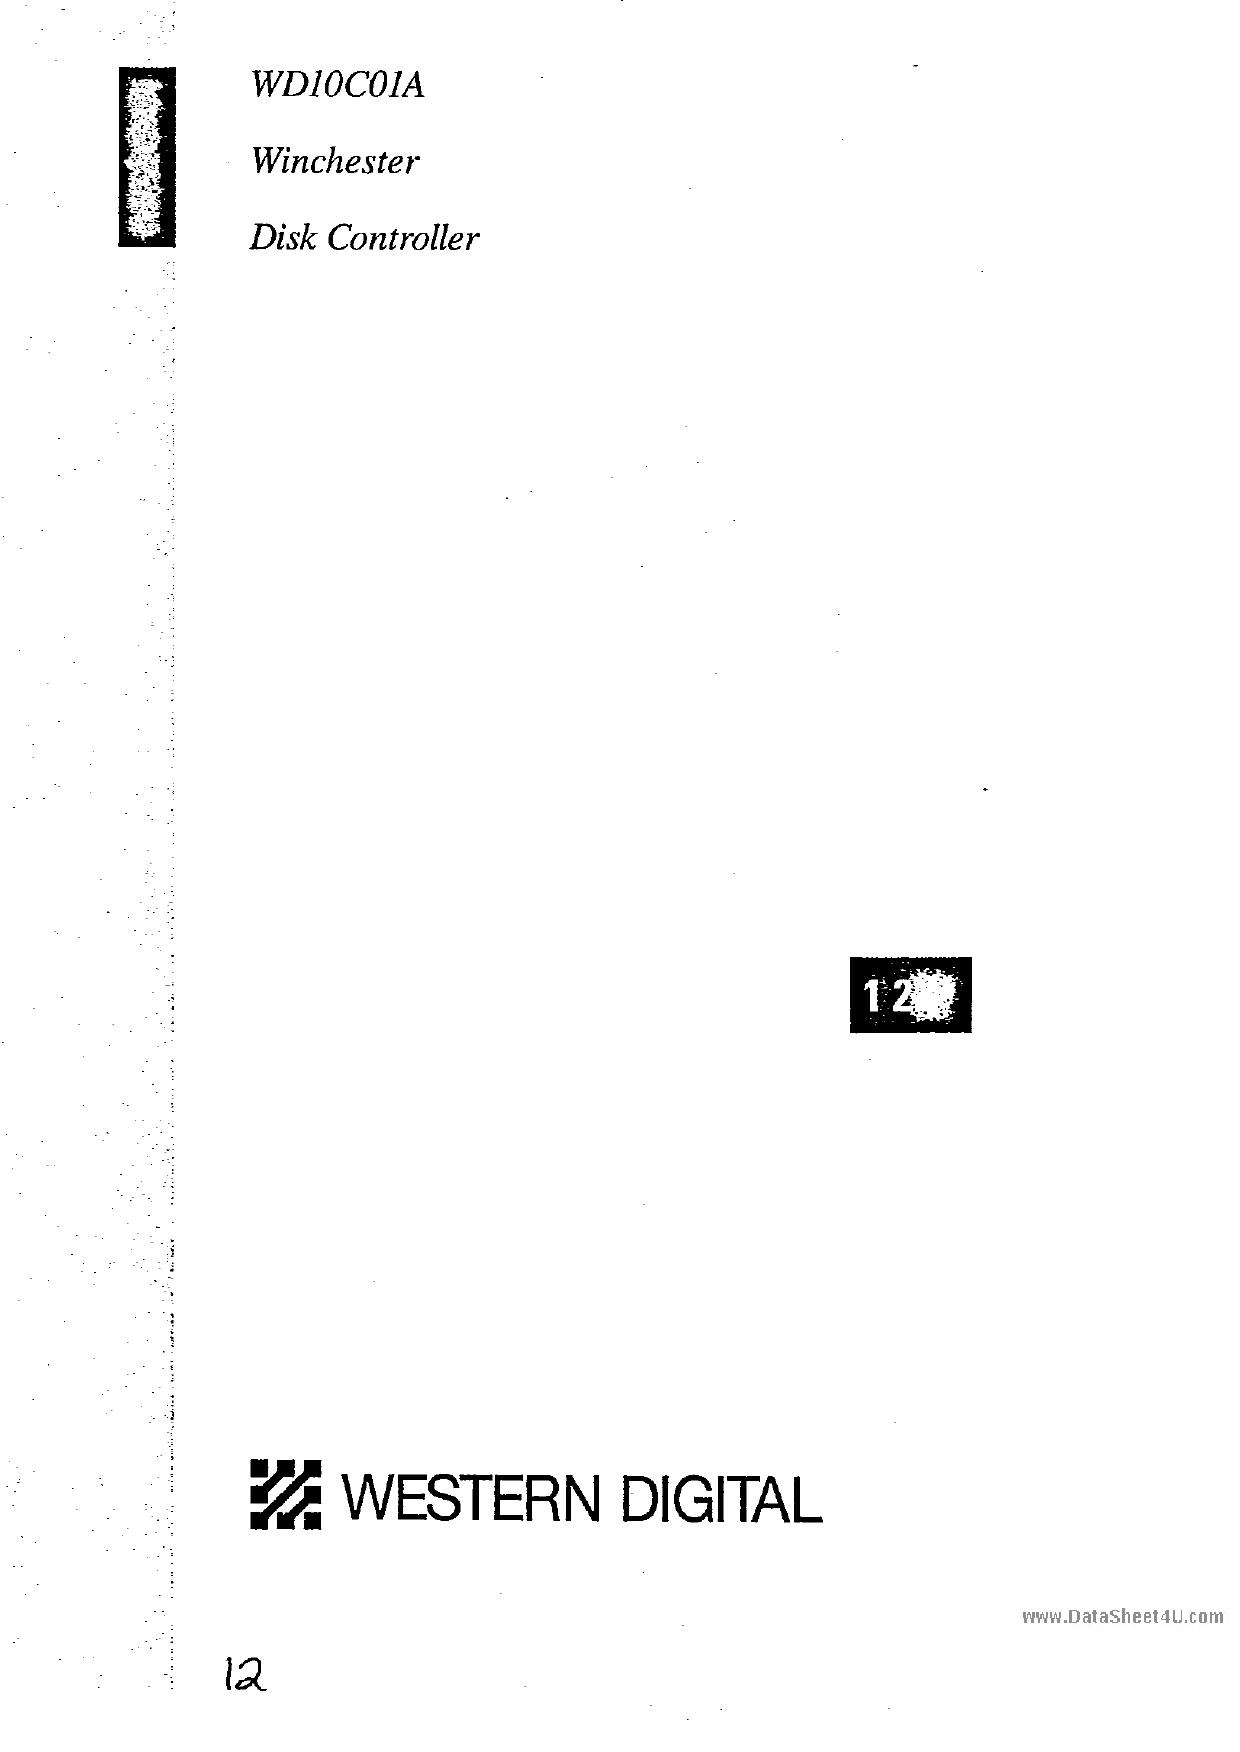 WD10C01A datasheet